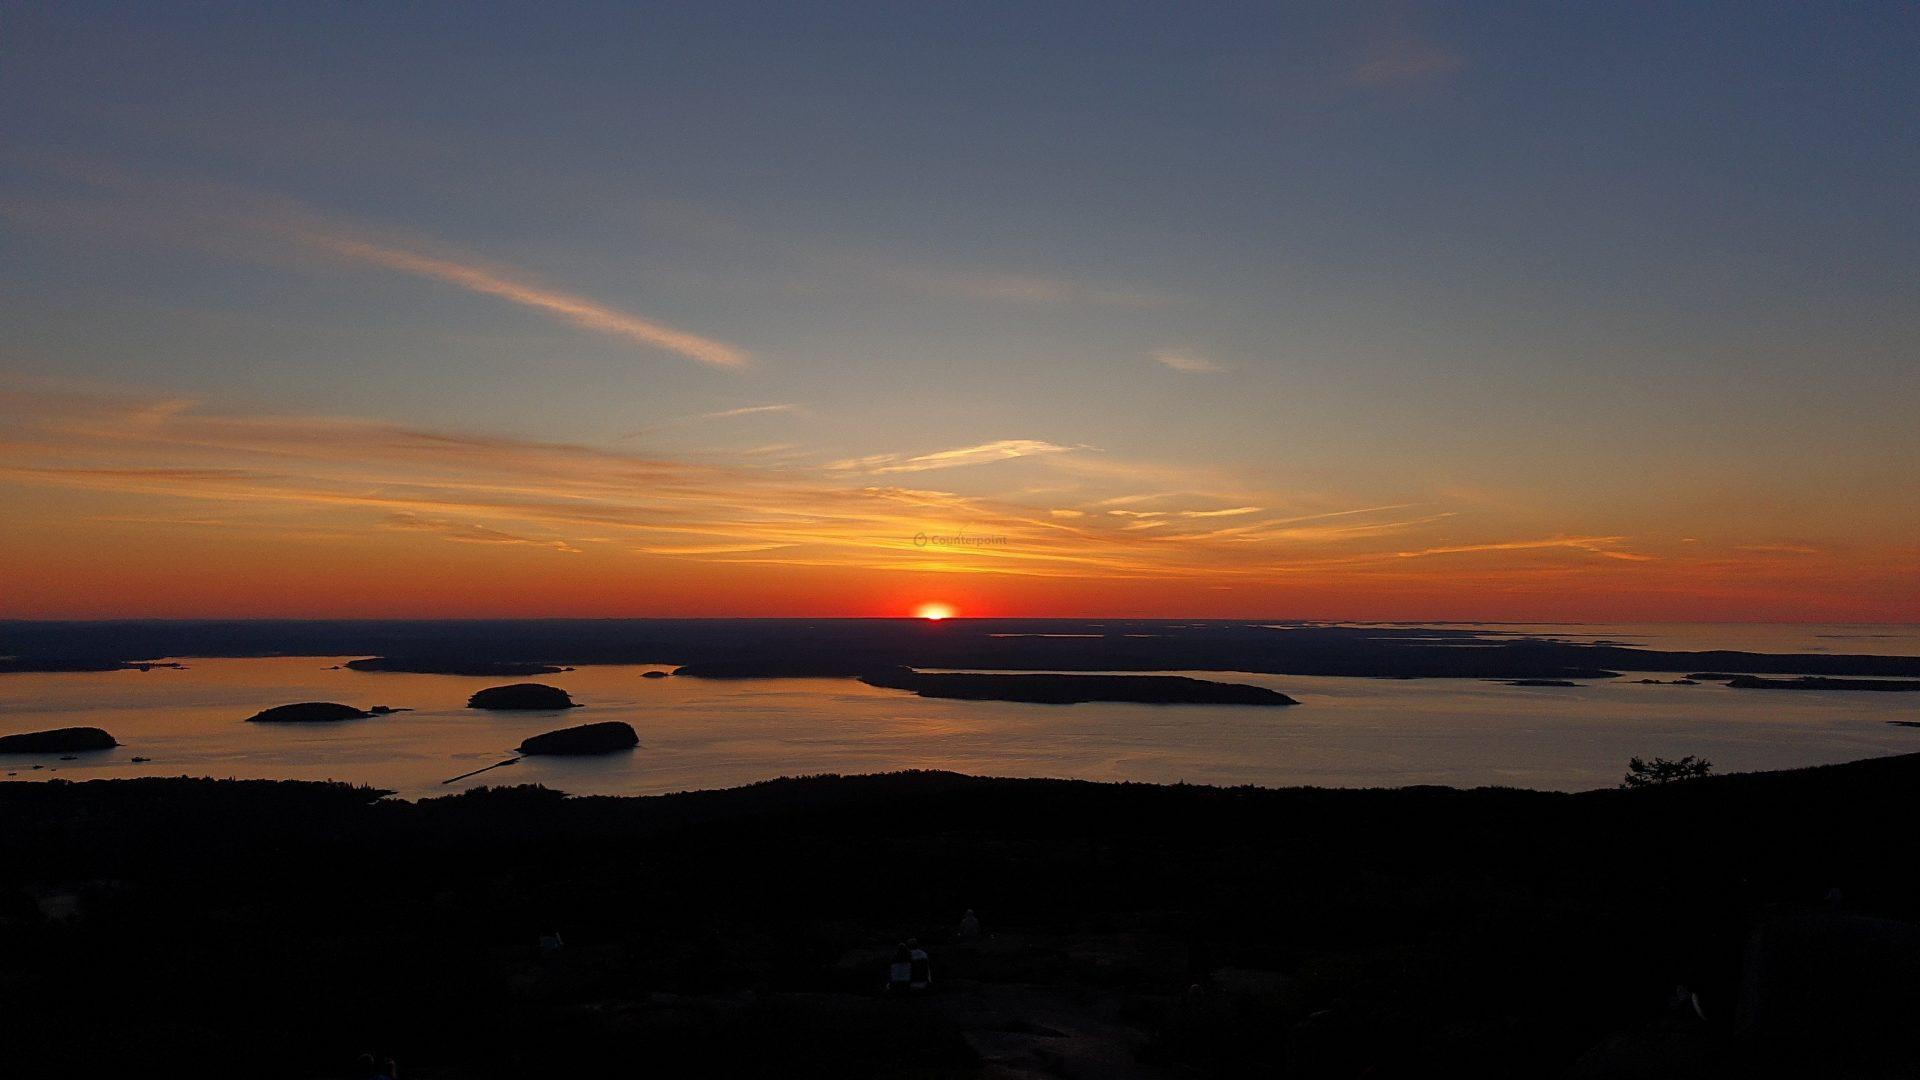 Sunrise Cadillac Mountain, Acadia Natl Park, Maine, USA - by Neil - Samsung Galaxy S10 Plus